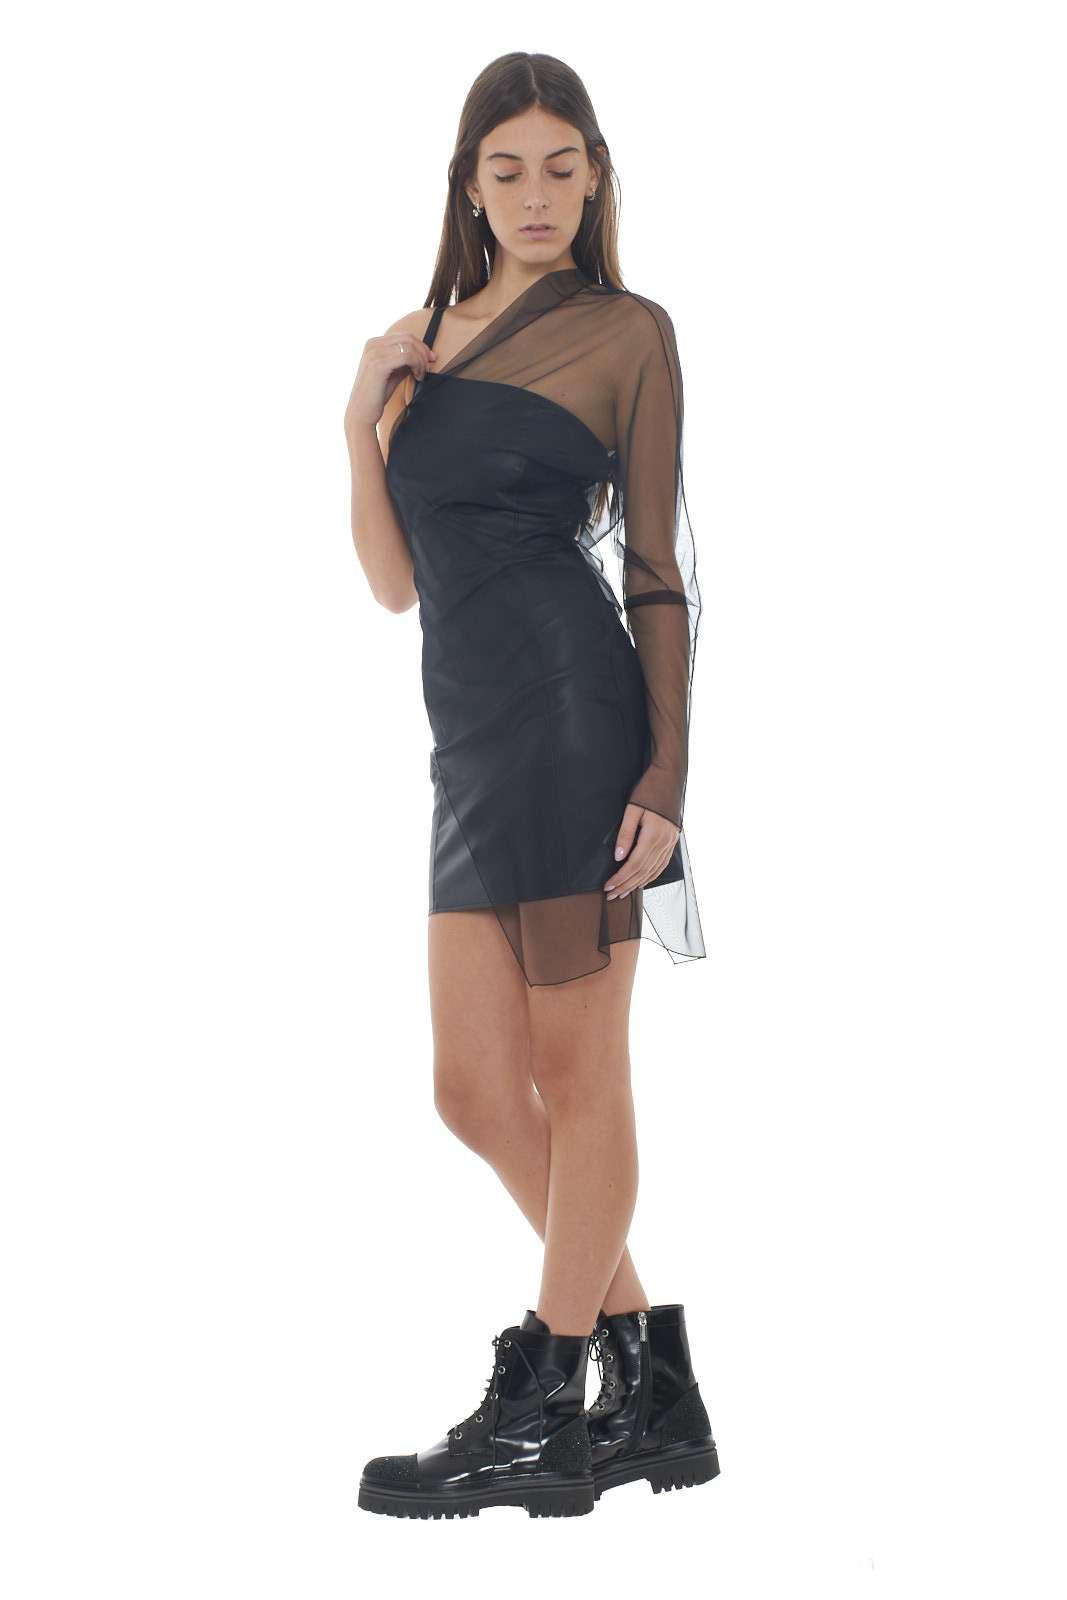 https://www.parmax.com/media/catalog/product/a/i/AI-outlet_parmax-abito-donna-Patrizia-Pepe-2l0848-B.jpg